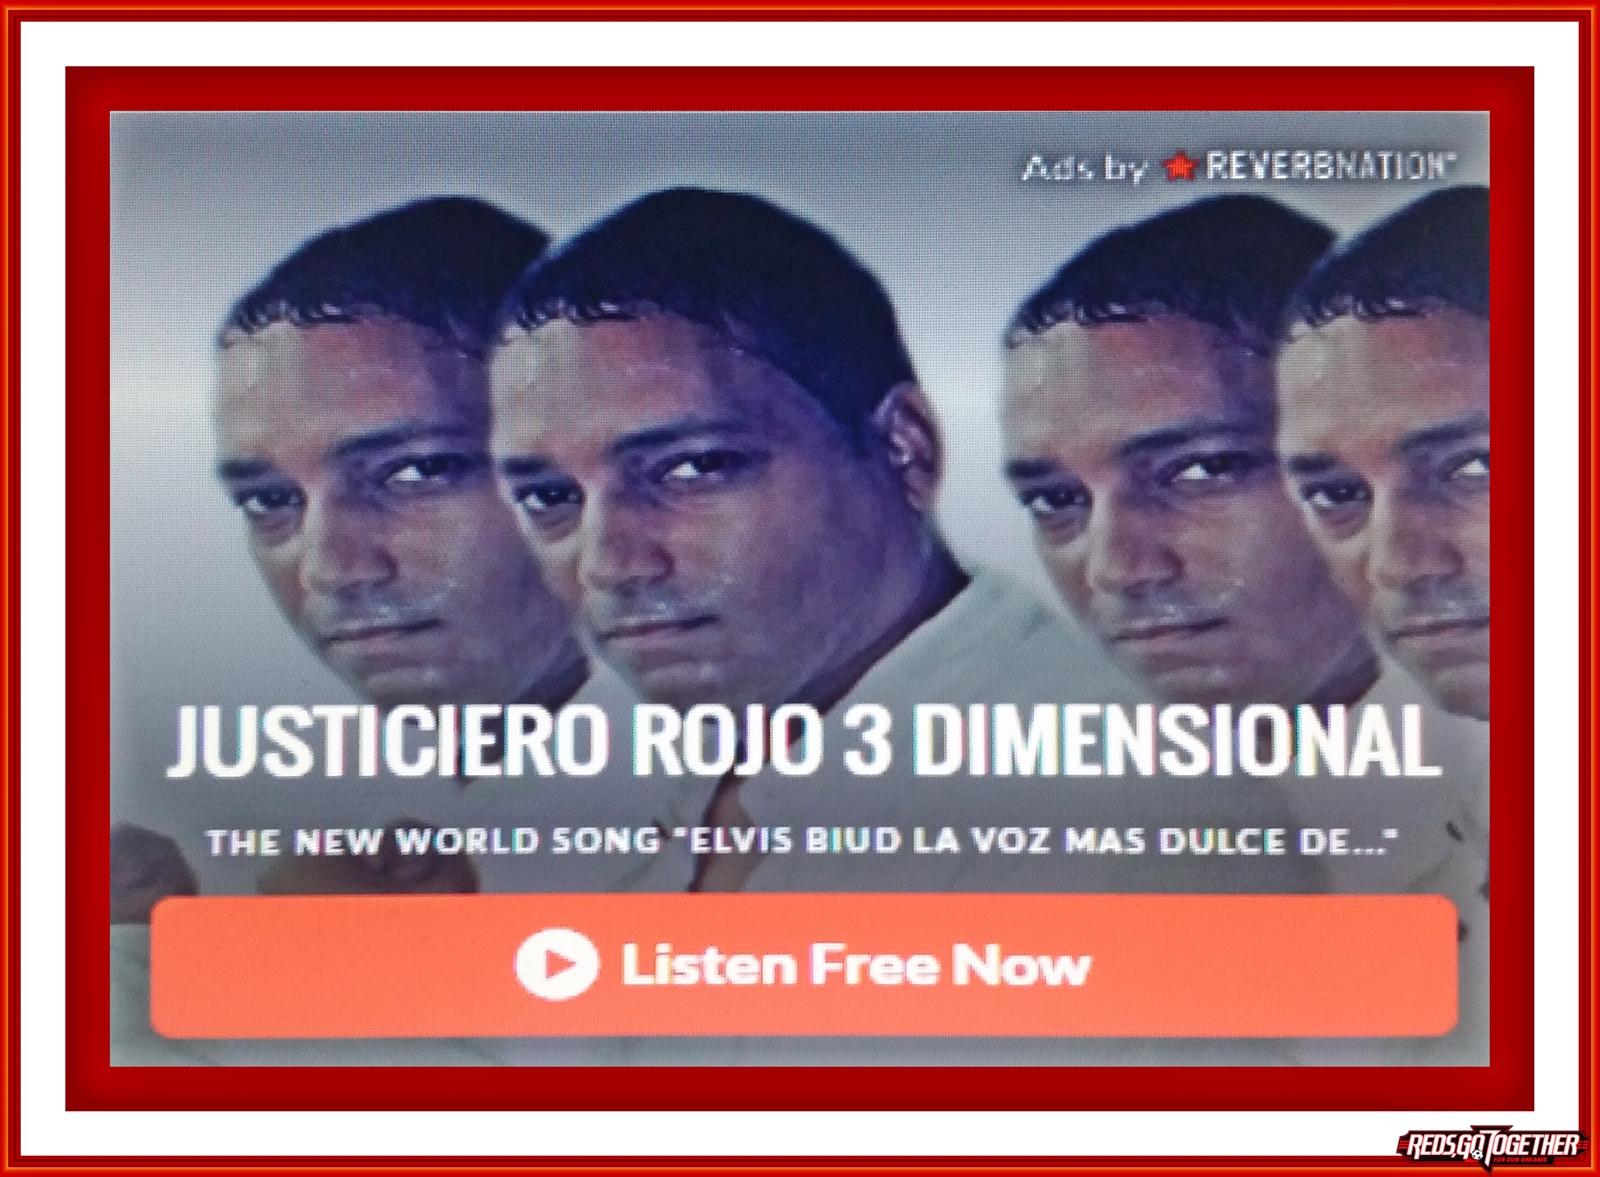 REVERBNATION  /  JUSTICIERO ROJO 3 DIMENSIONAL